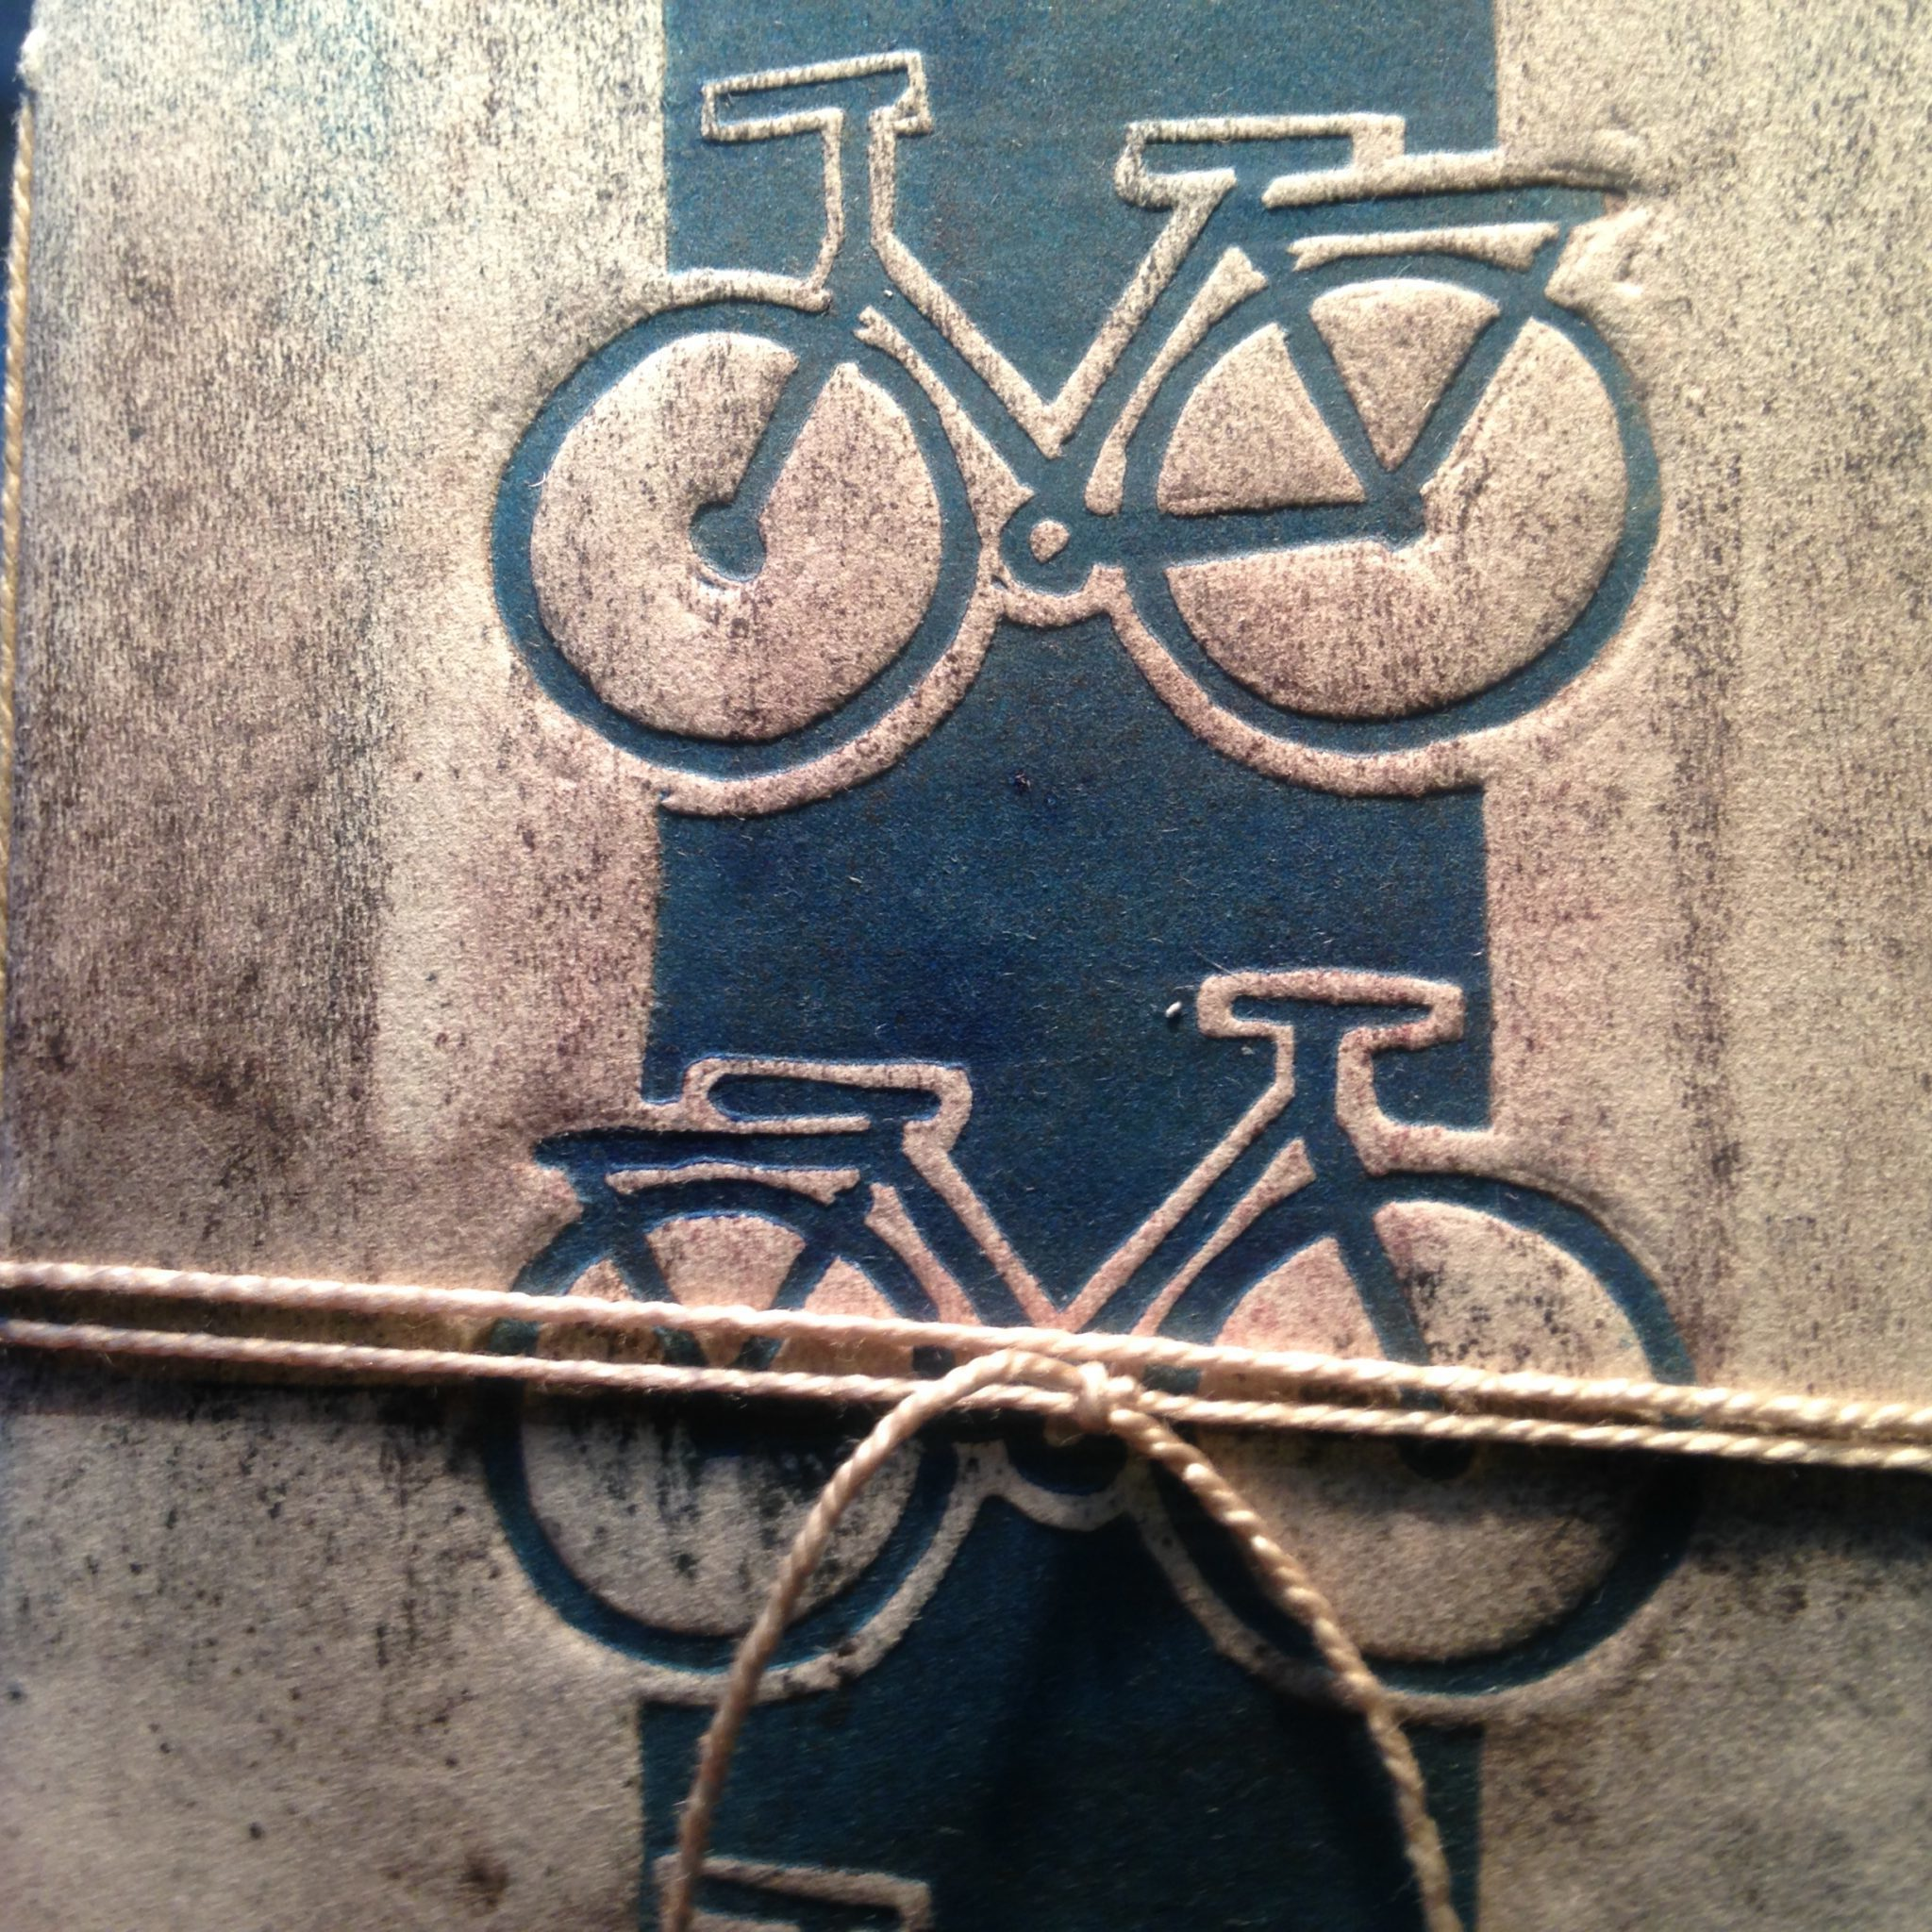 LinoLino | Linogravure et créations à partir d'impressions artisanales | Chambéry, France | Impression originale illustration detail carnet velo gaufrage